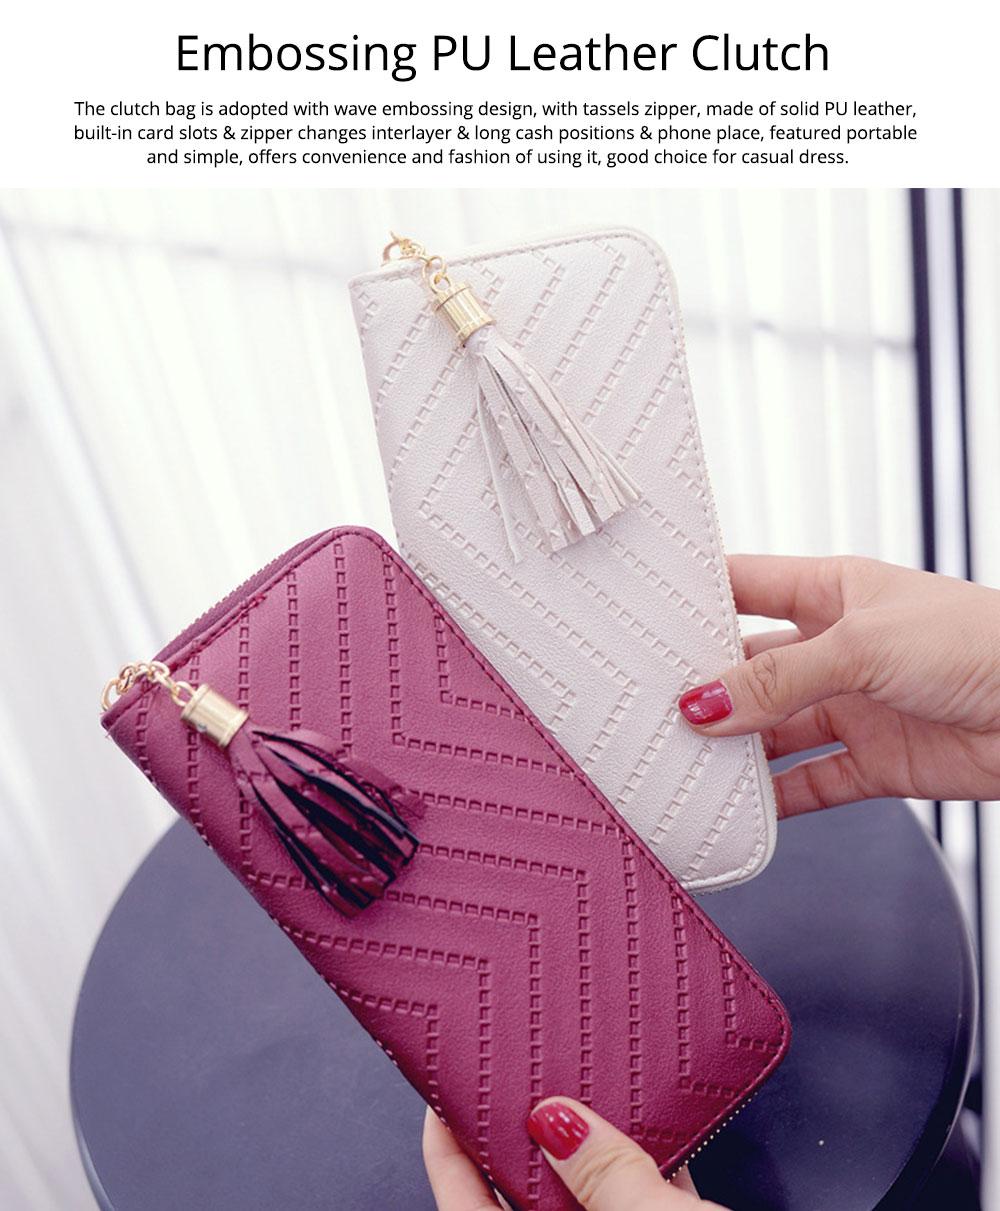 Women Handbag Business PU Leather Wallet, Zipper Tassels Card Holder Mini Purse Long Clutch, Casual Phone Bag 0